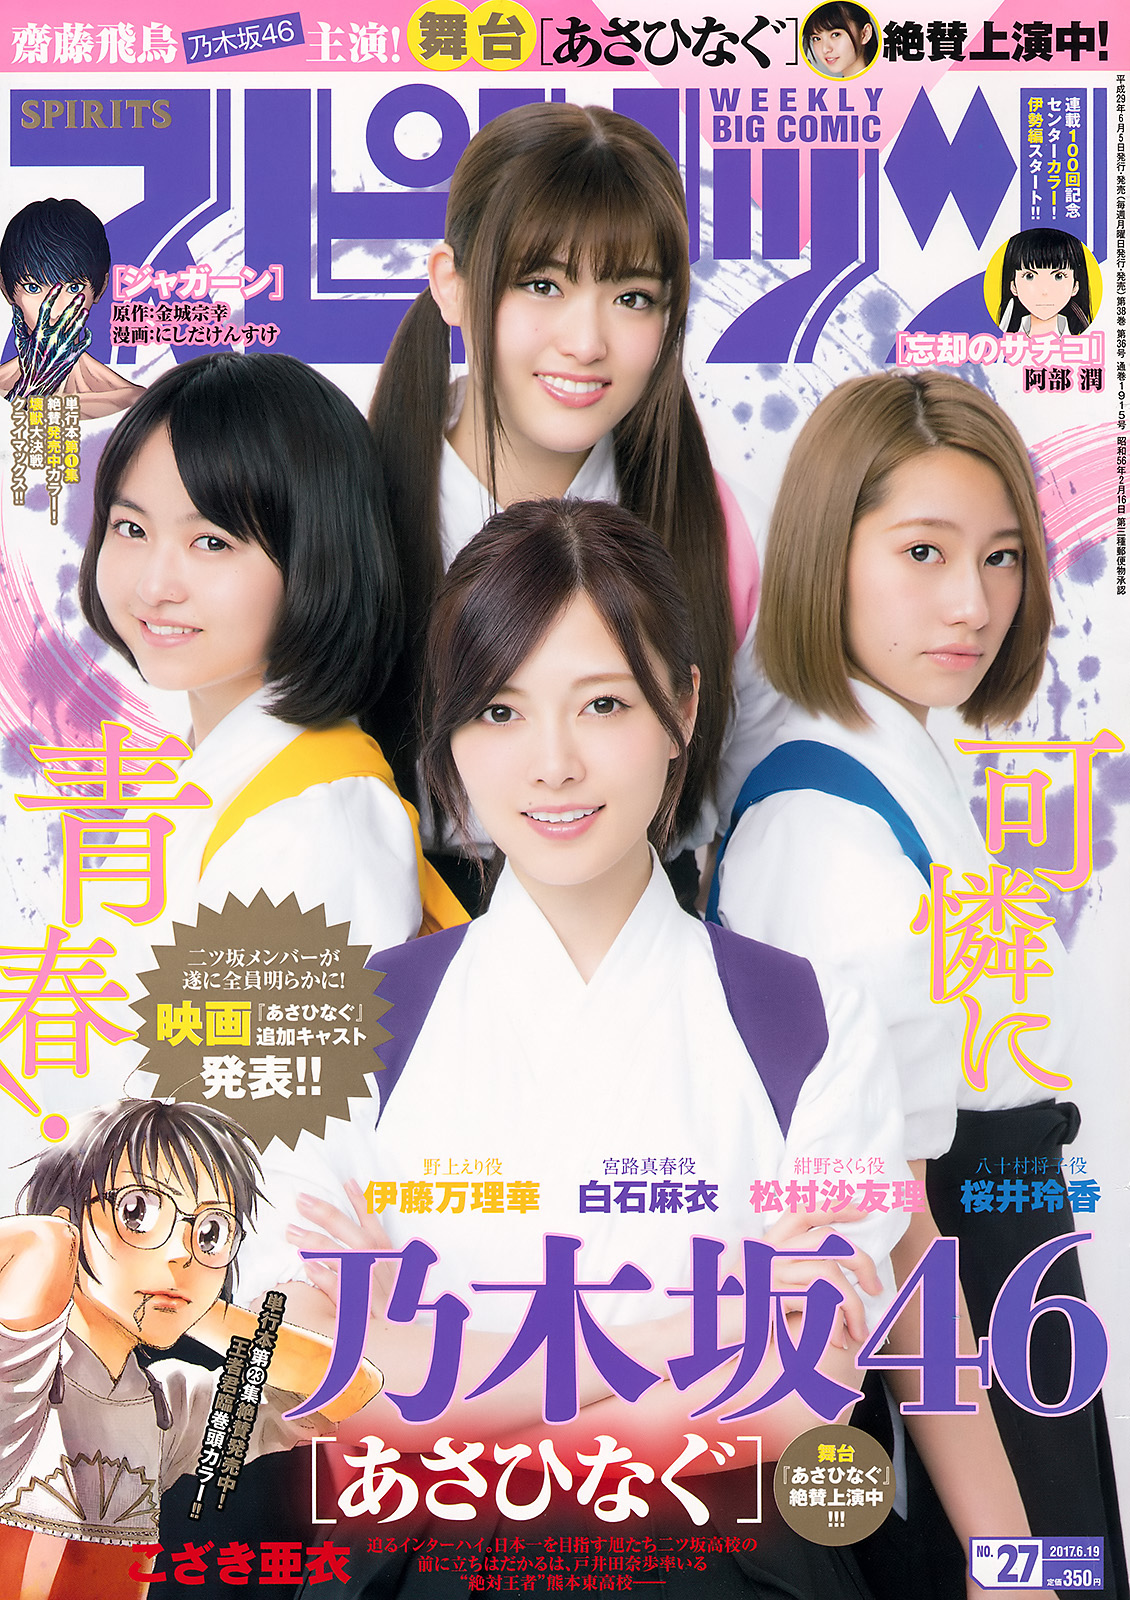 Nogizaka46, Big Comic Spirits 2017.06.19 No.27 (週刊スピリッツ 2017年27号)